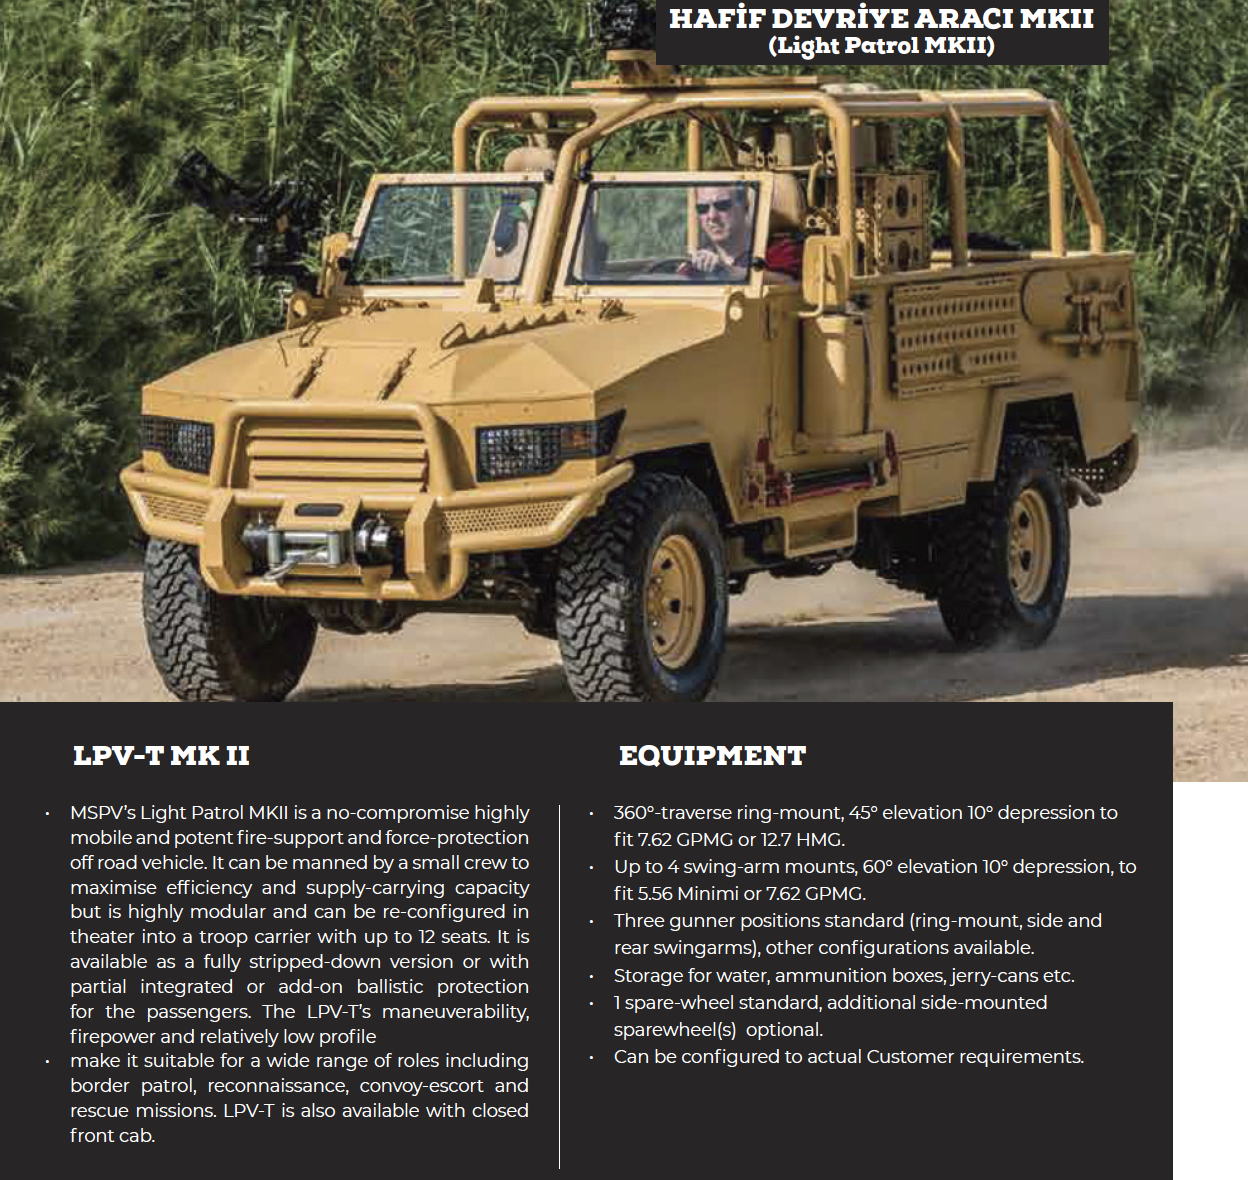 Hafif Devriye Aracı (Light Patrol) MKII